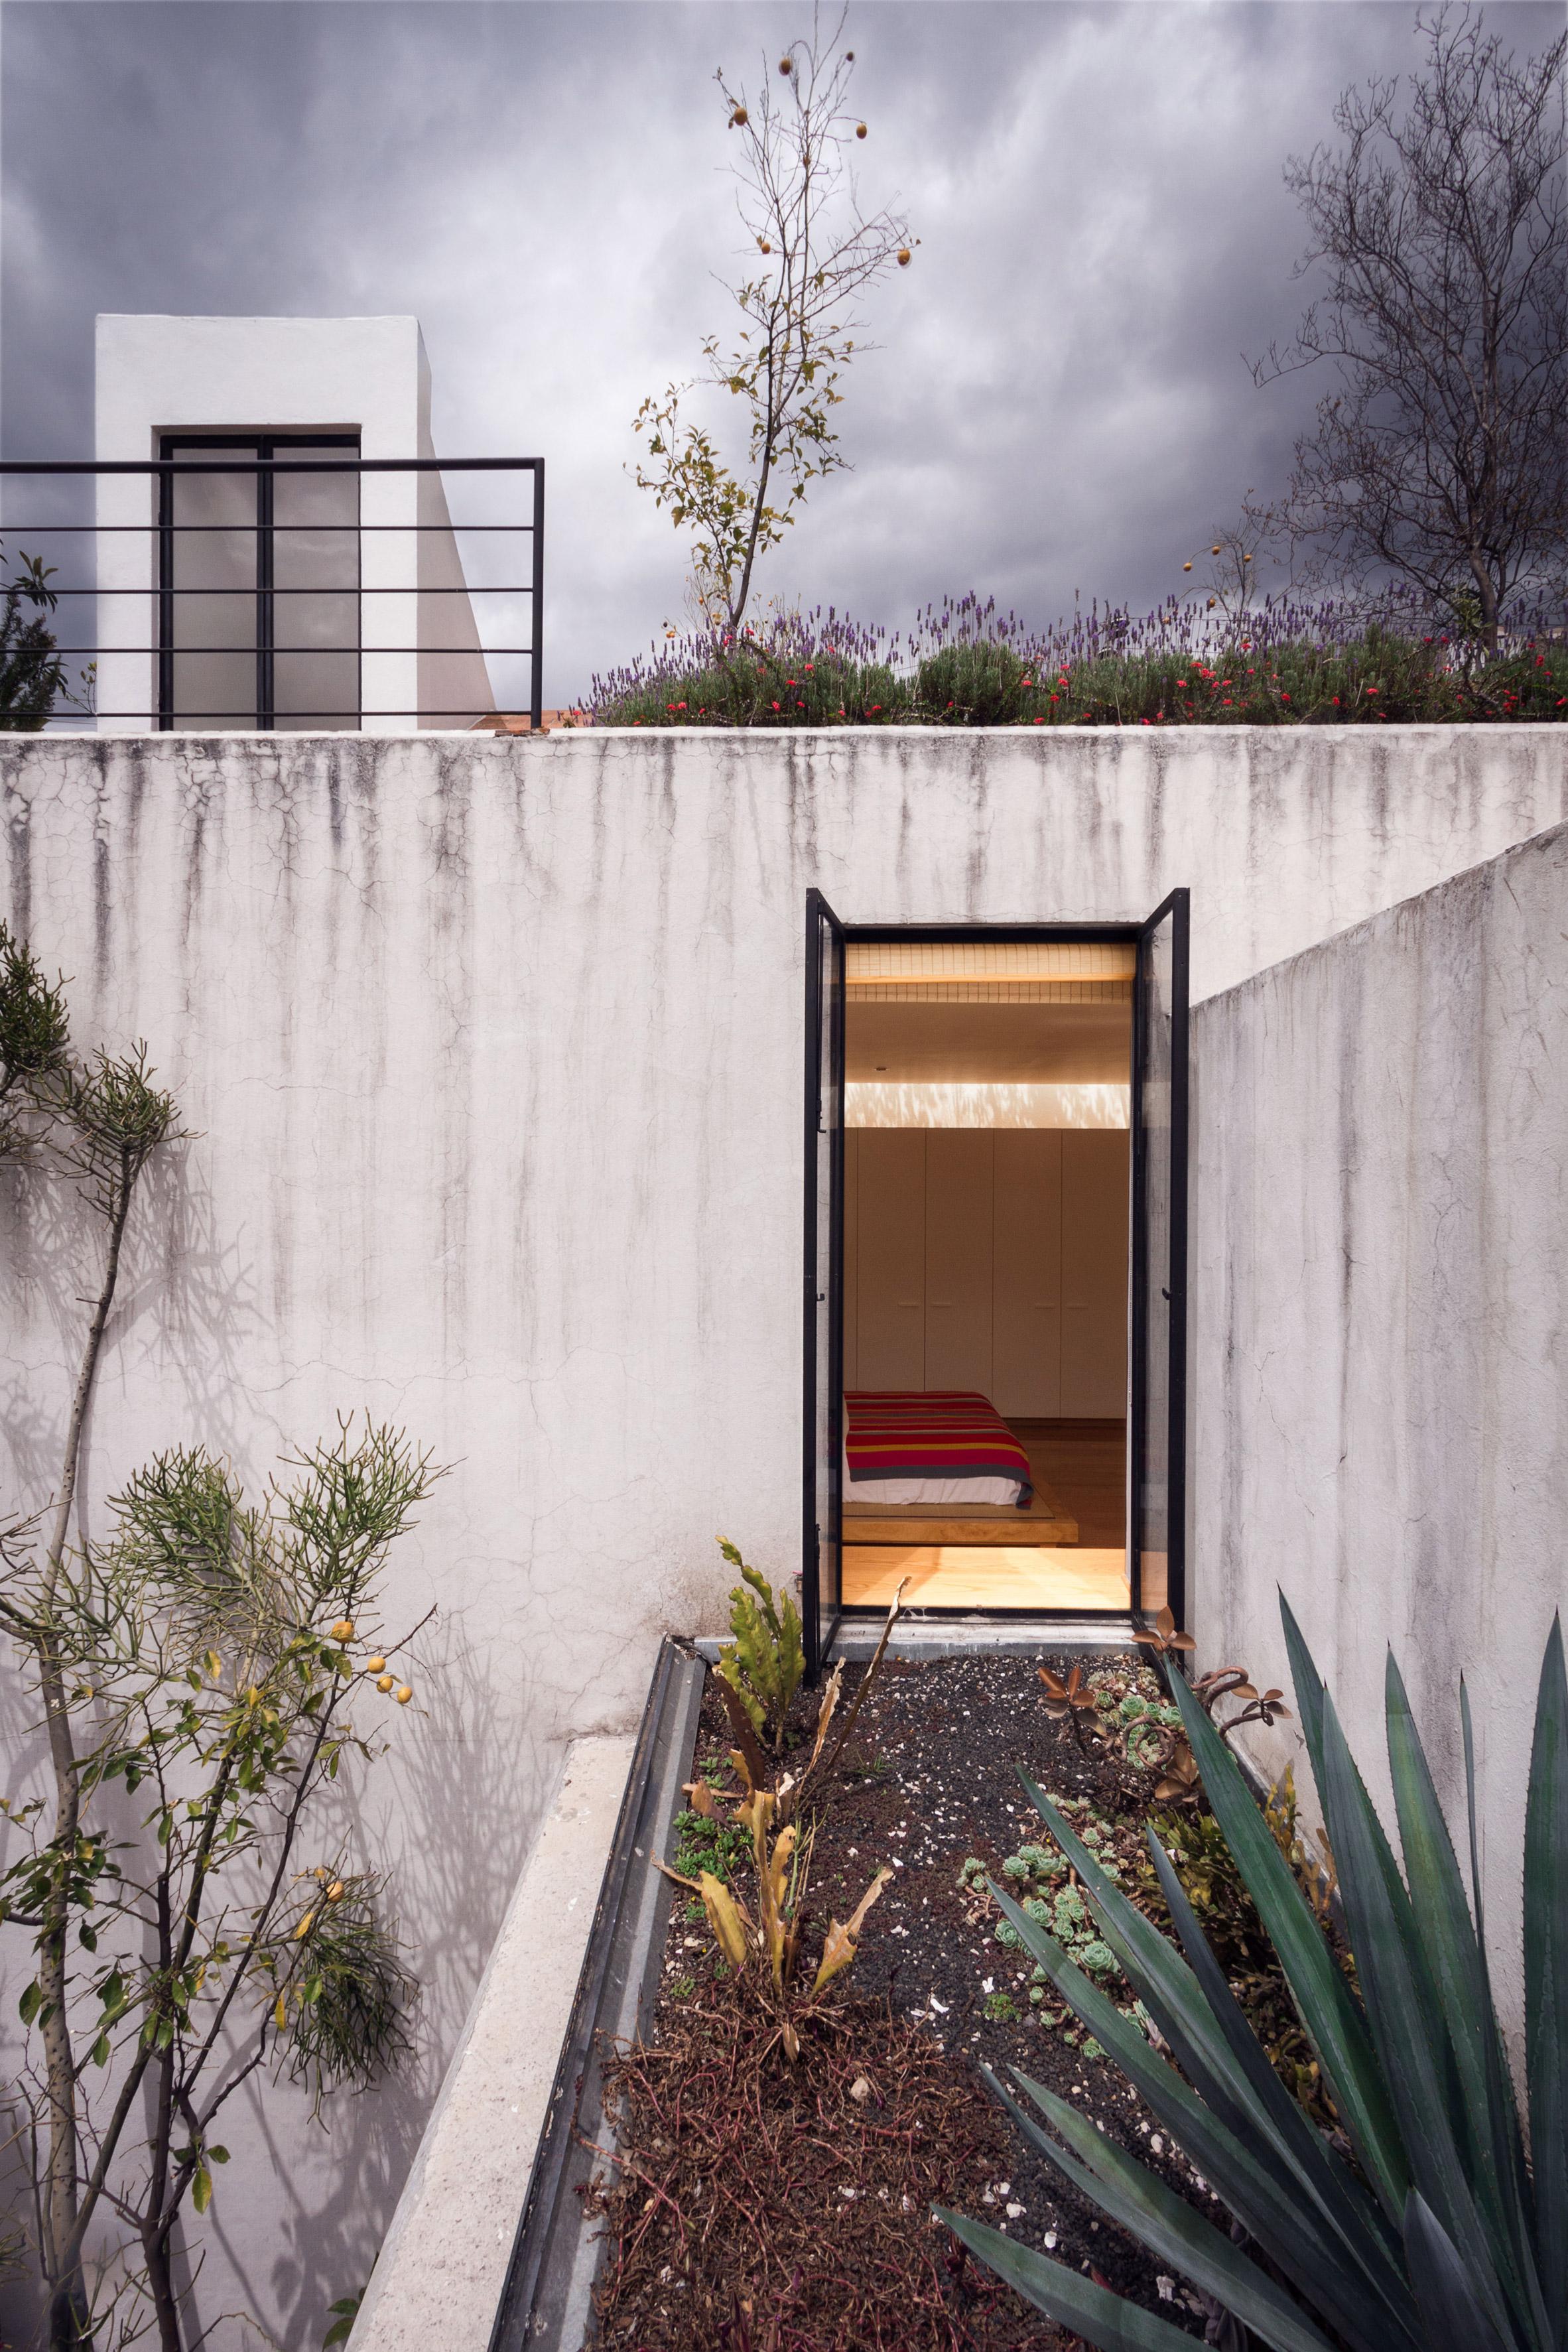 Veramendi House by Andres Stebelski